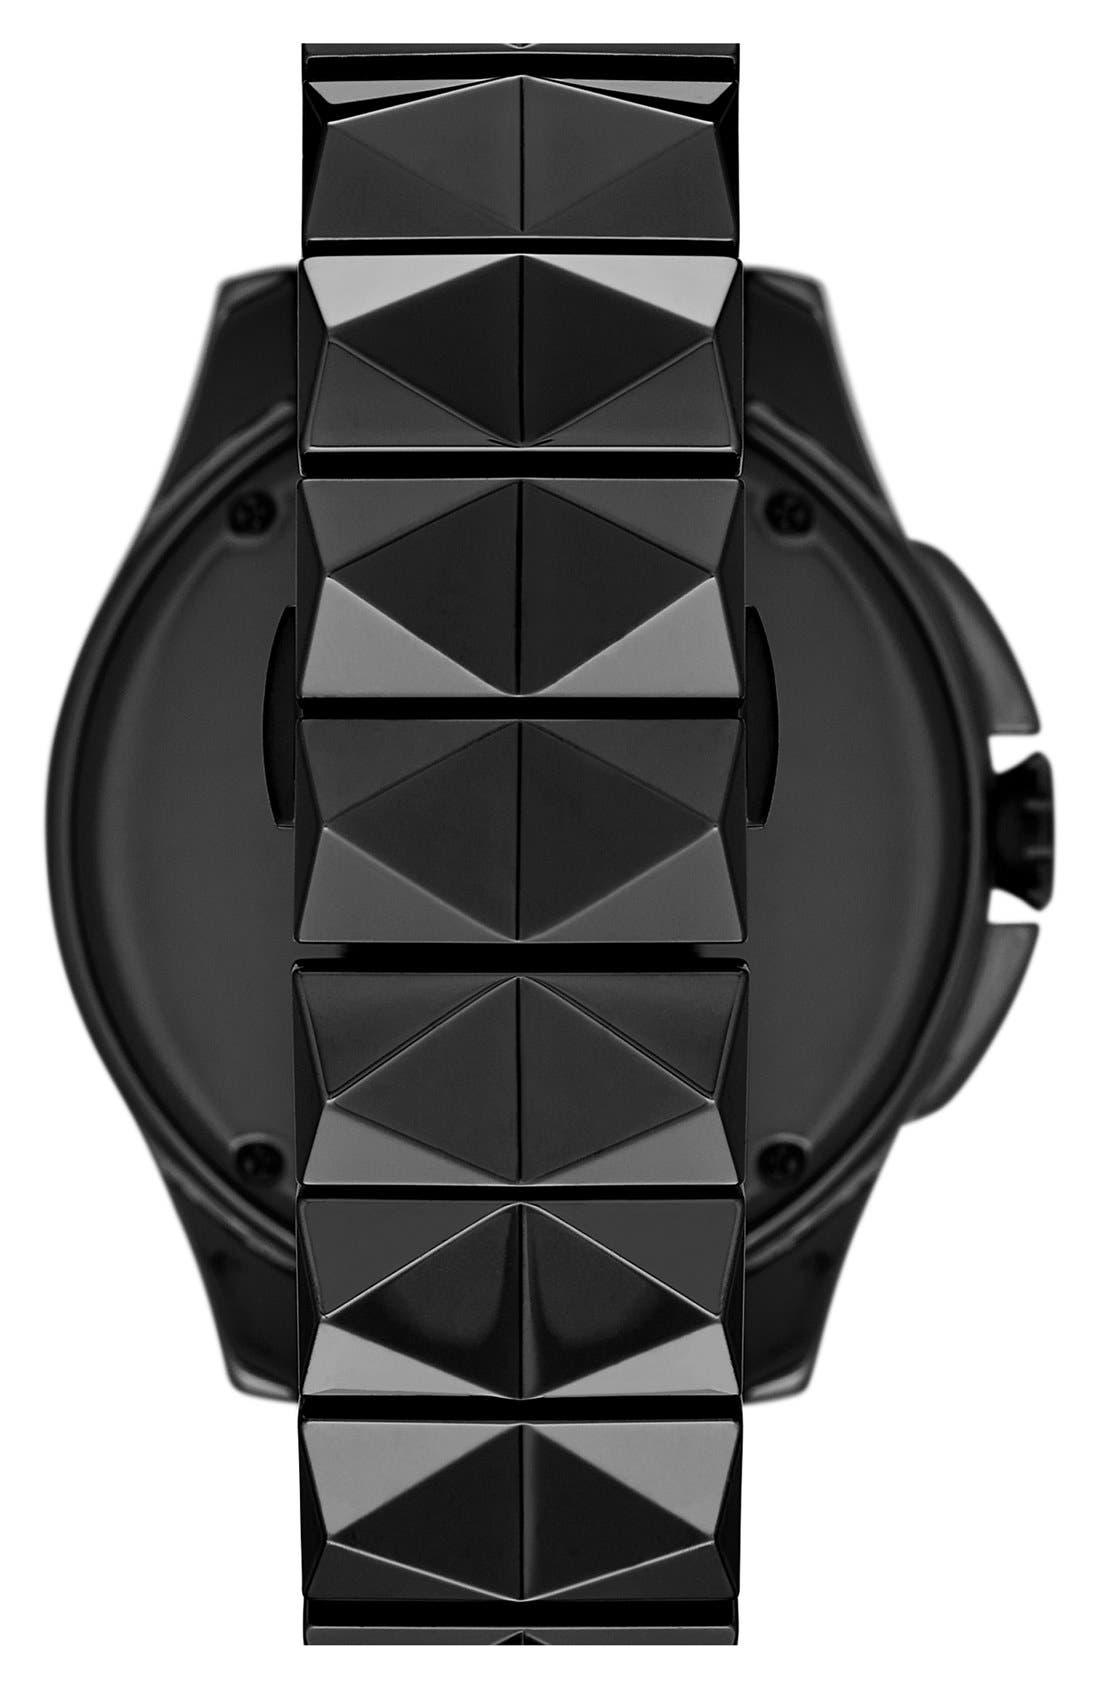 Alternate Image 2  - KARL LAGERFELD '7' Faceted Bezel Ceramic Bracelet Watch, 44mm